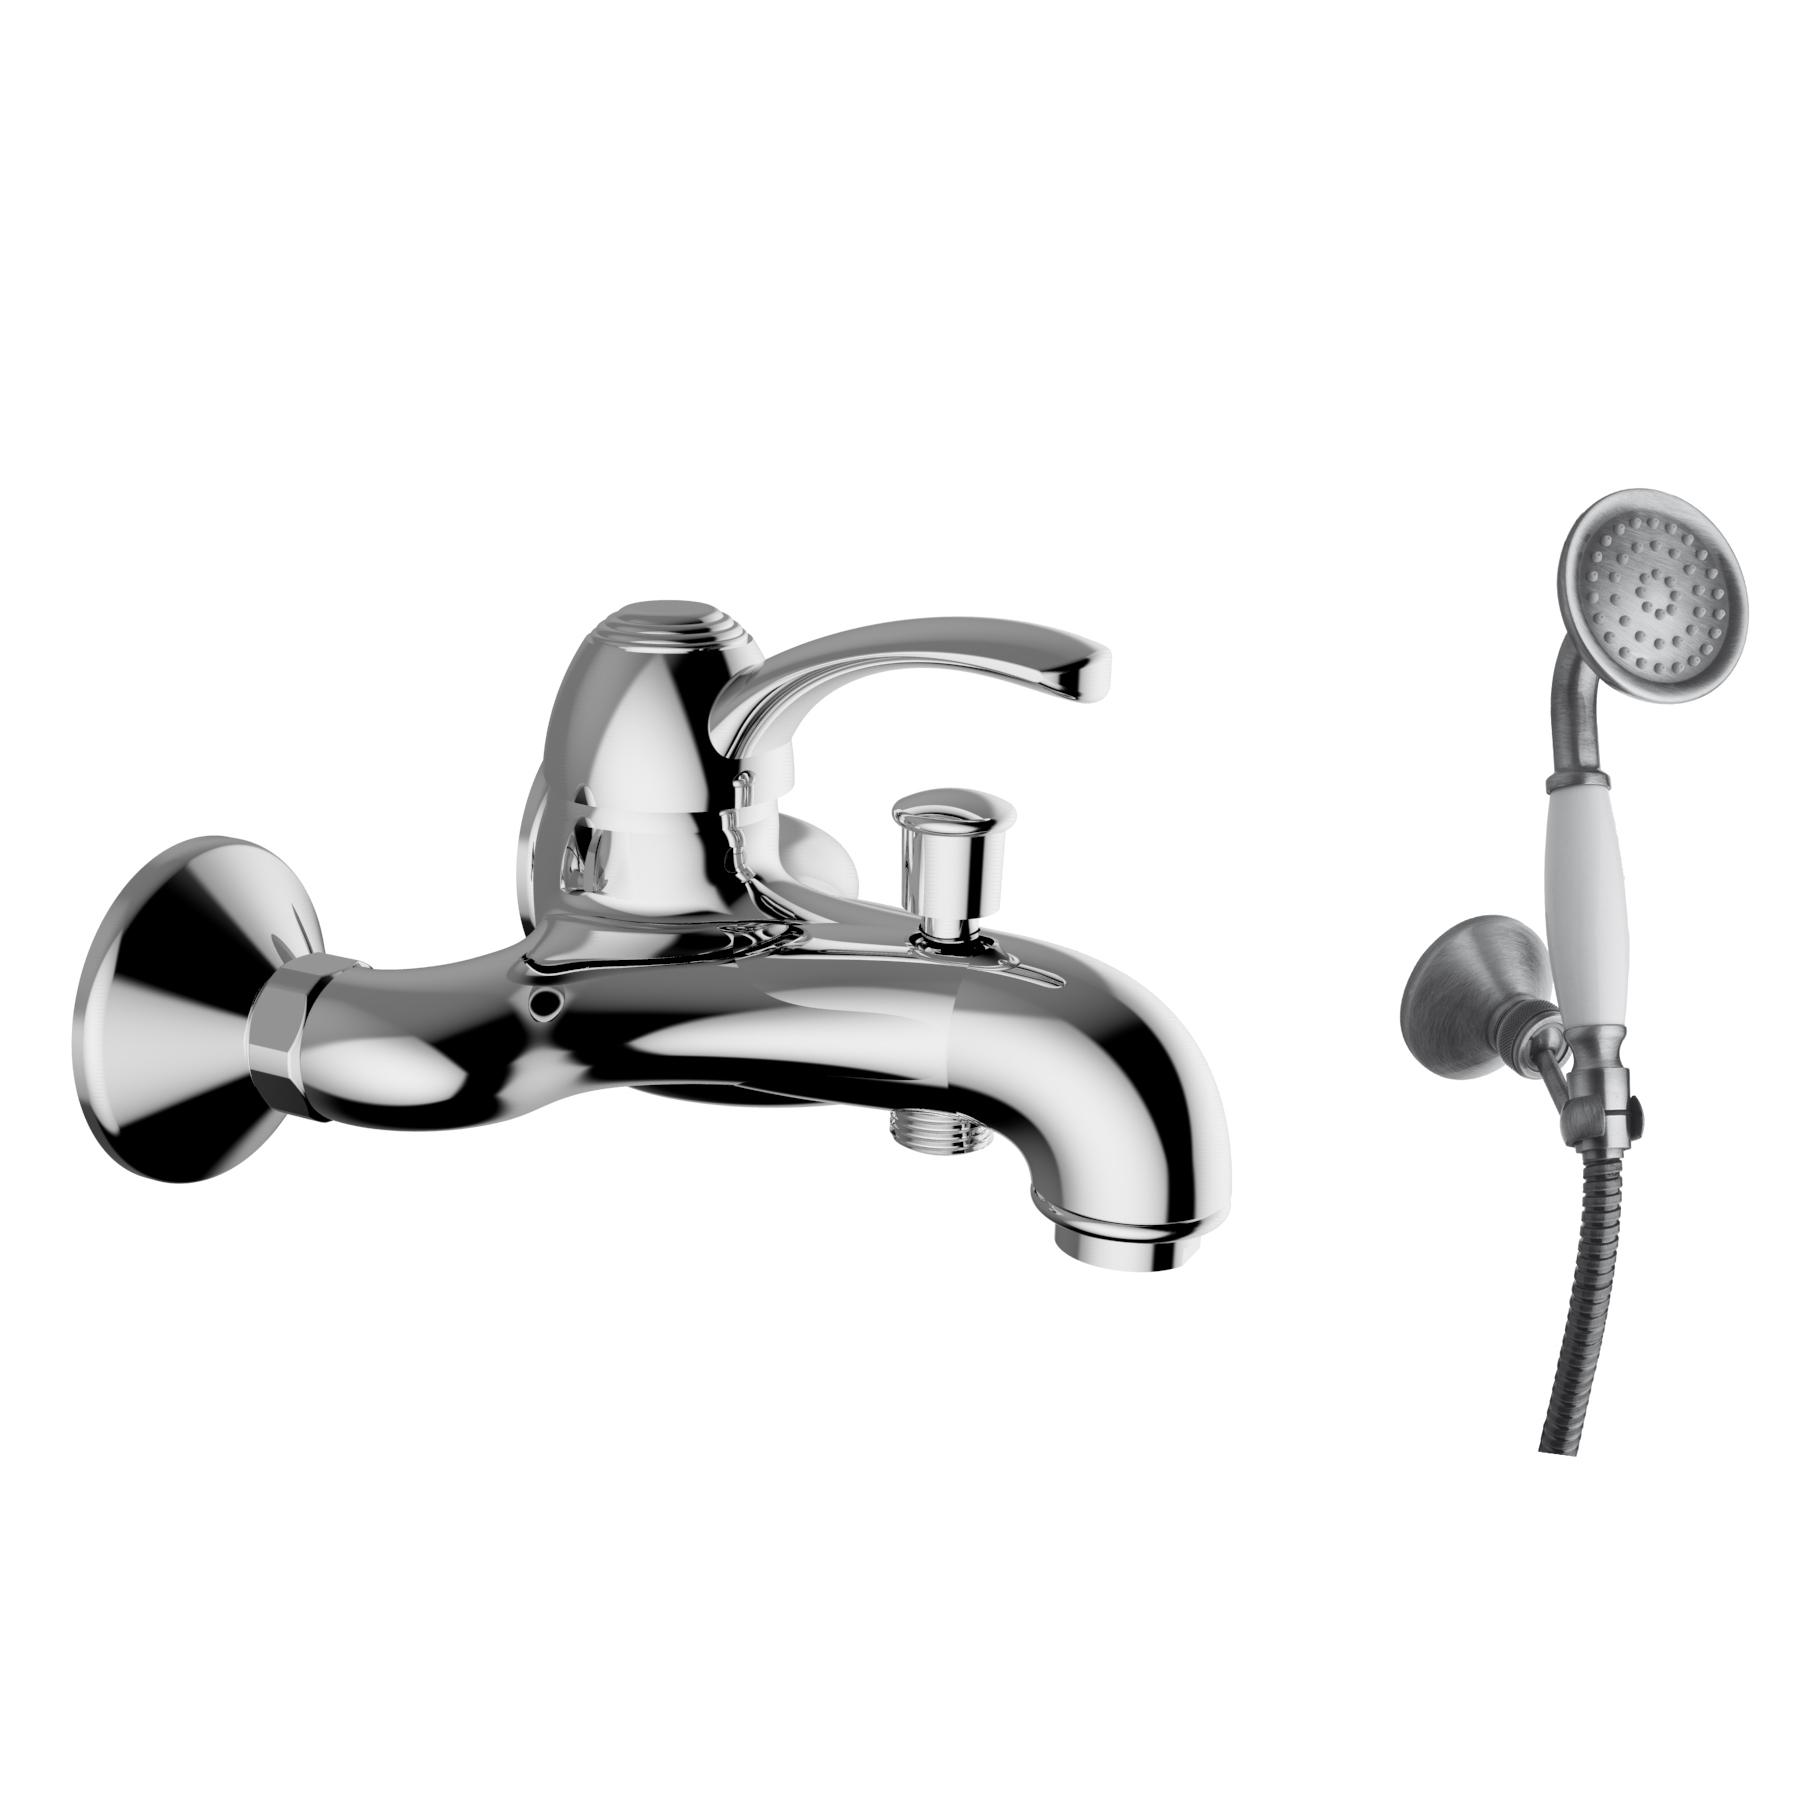 Immagine HD JAR 2 bath mixer